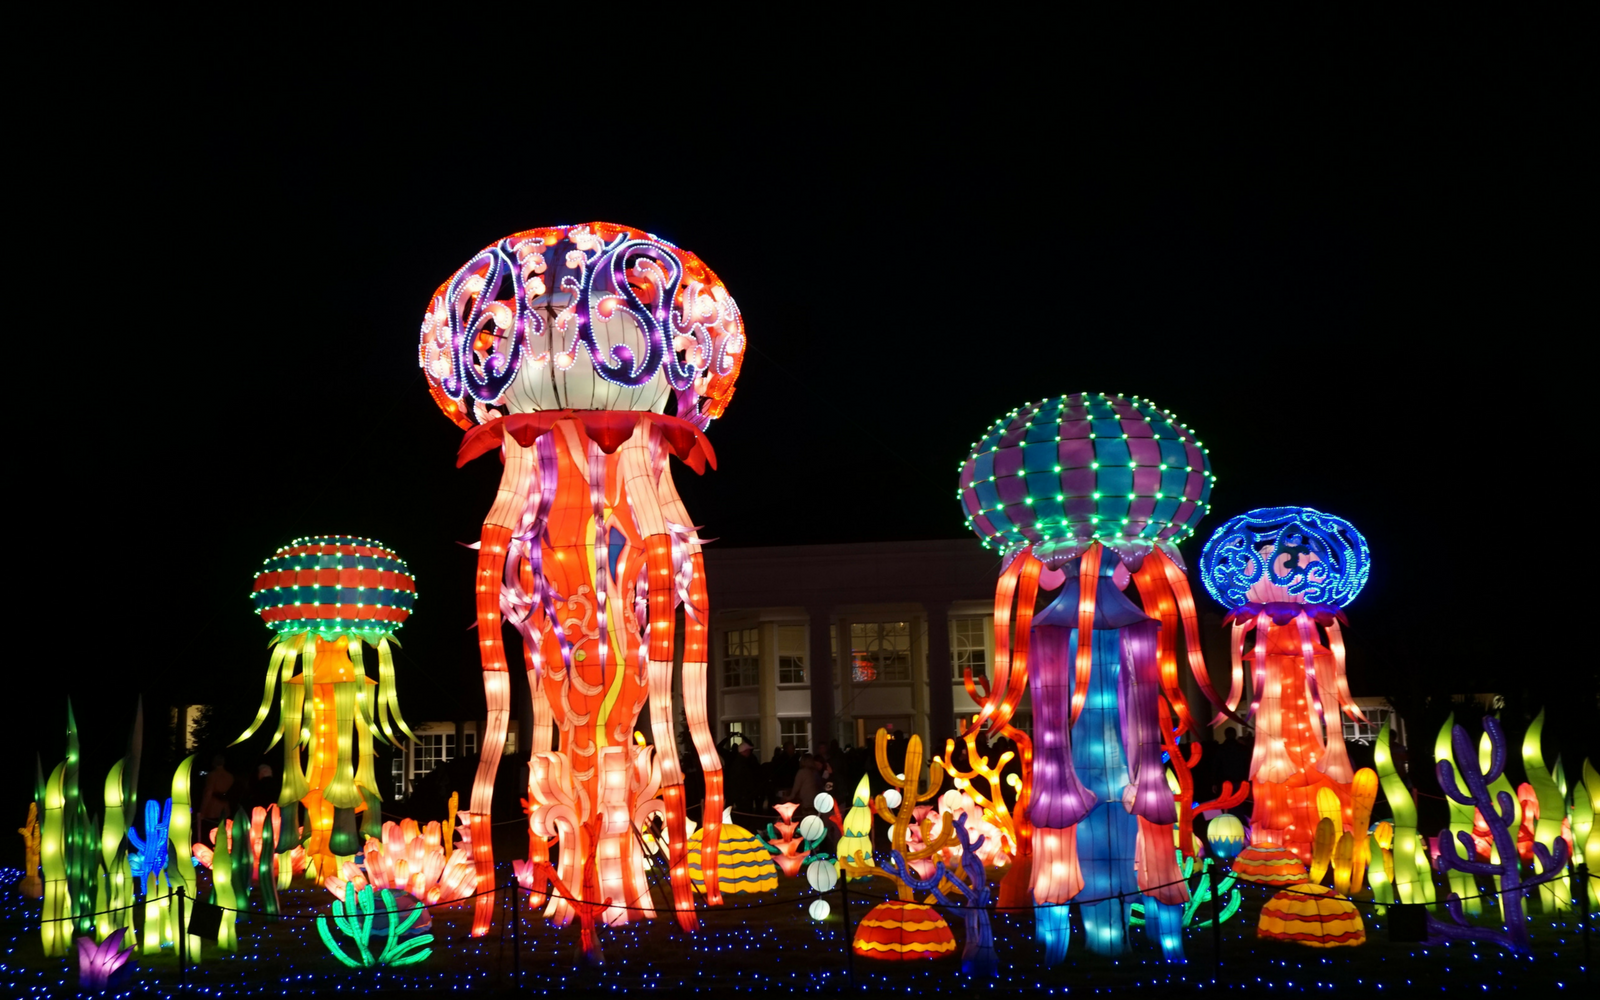 Daniel Stowe Botanical Garden Hosted An Amazing Chinese Lantern Festival